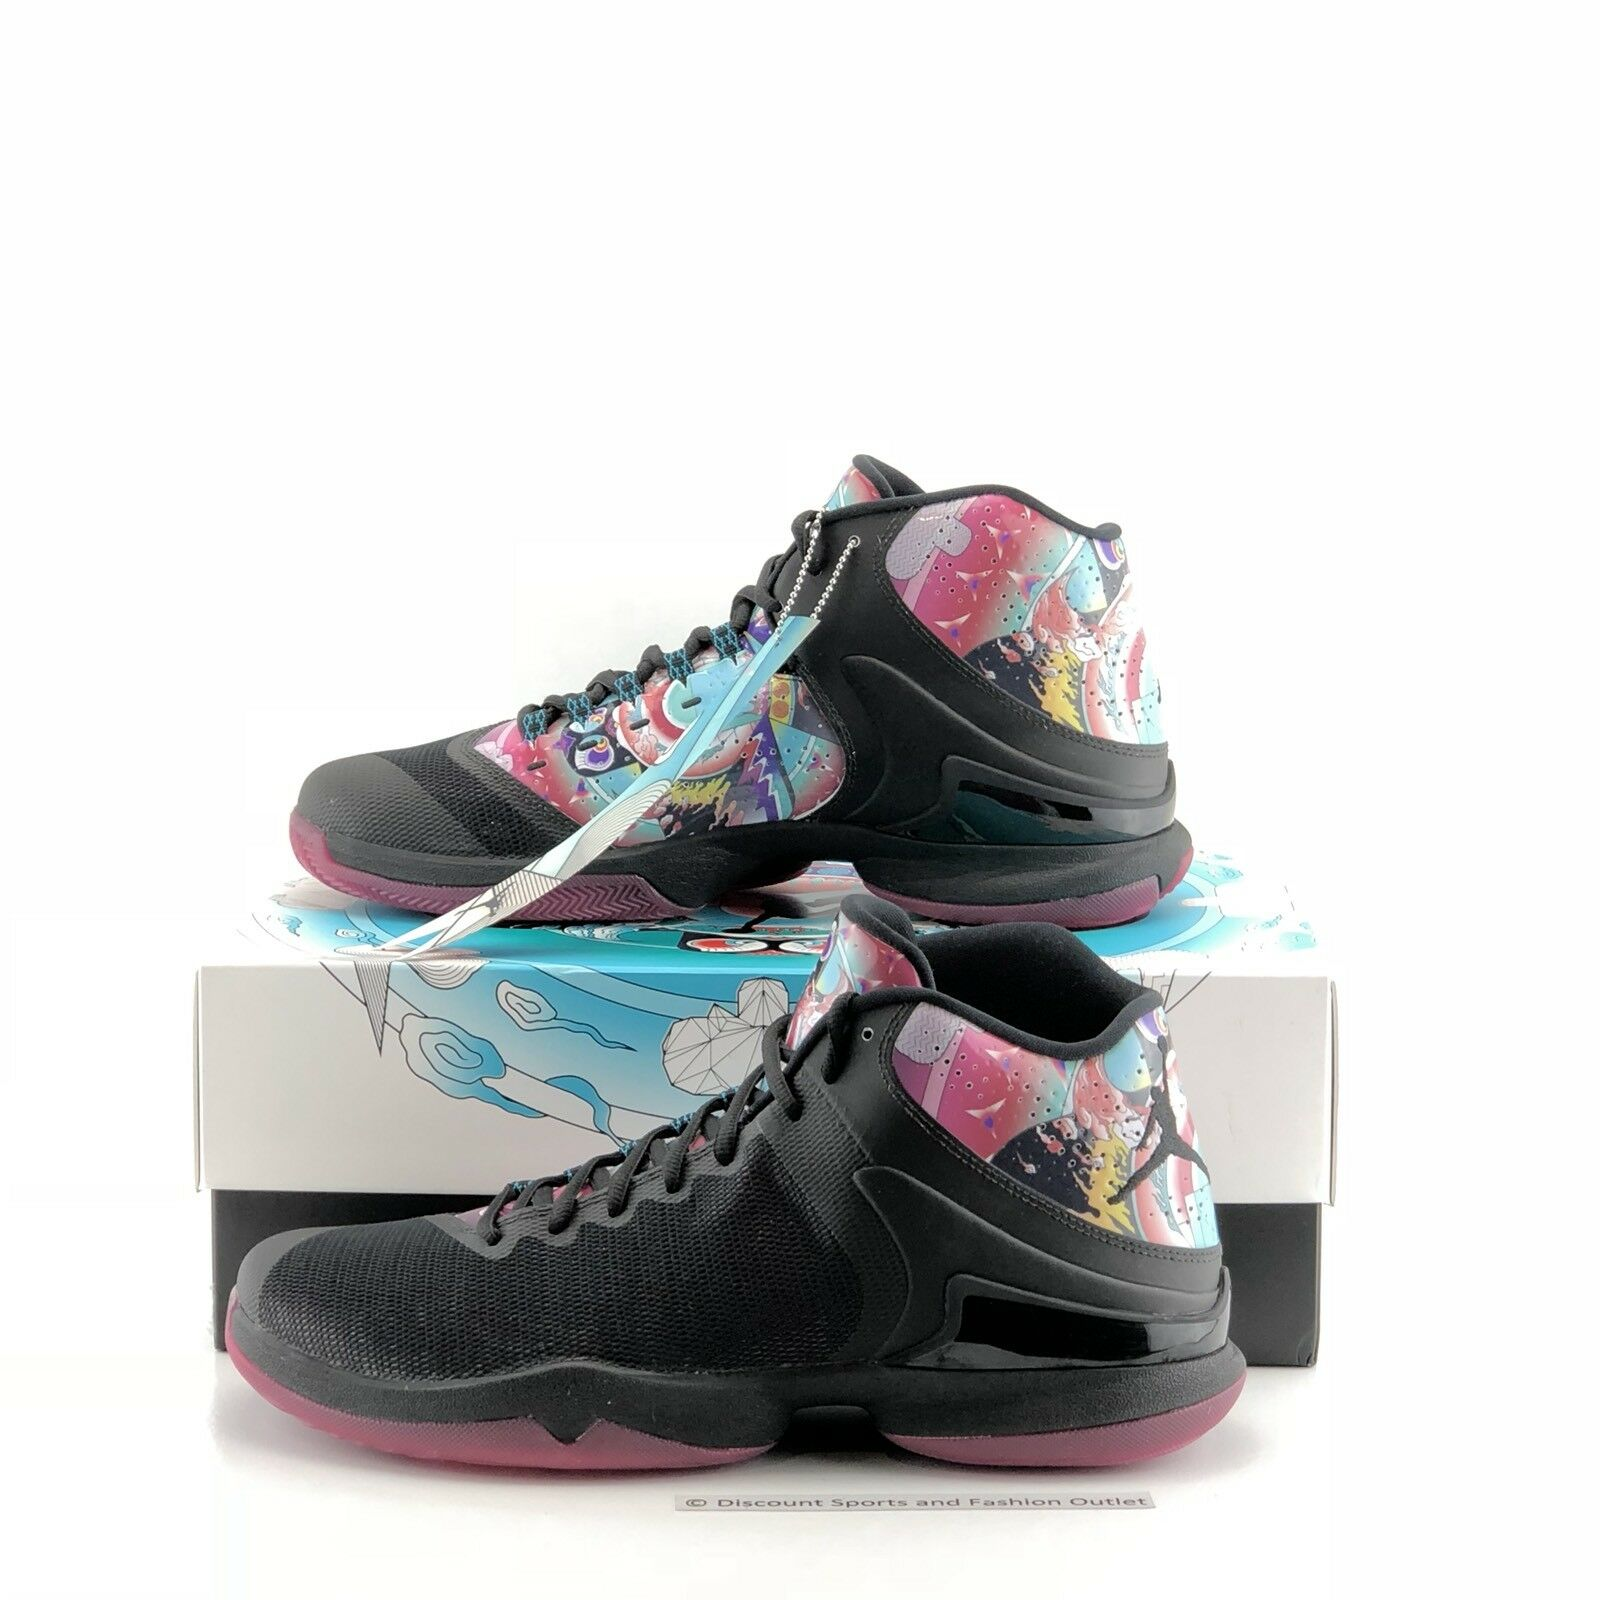 Nike jordan super.fly po cny formatori metà - moda casual - metà () bbafbd